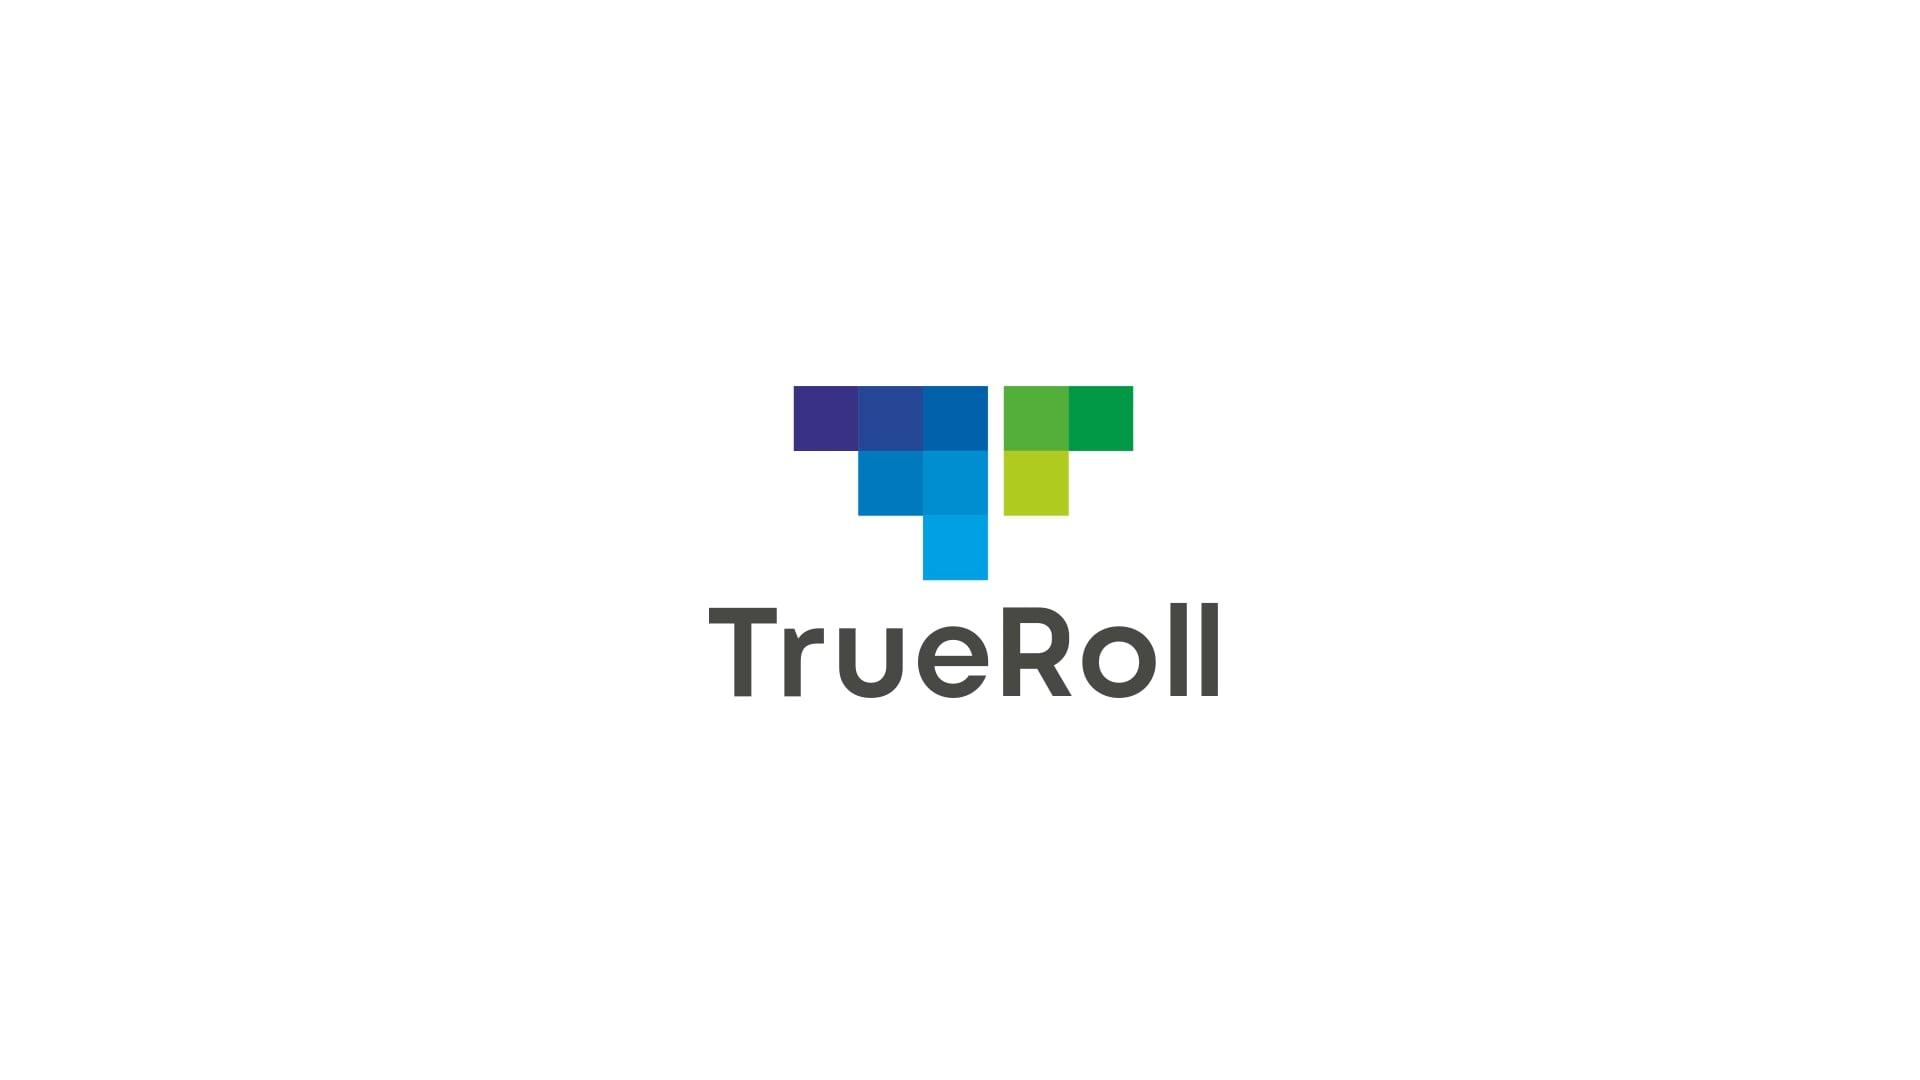 TrueRoll Is Cost Effective